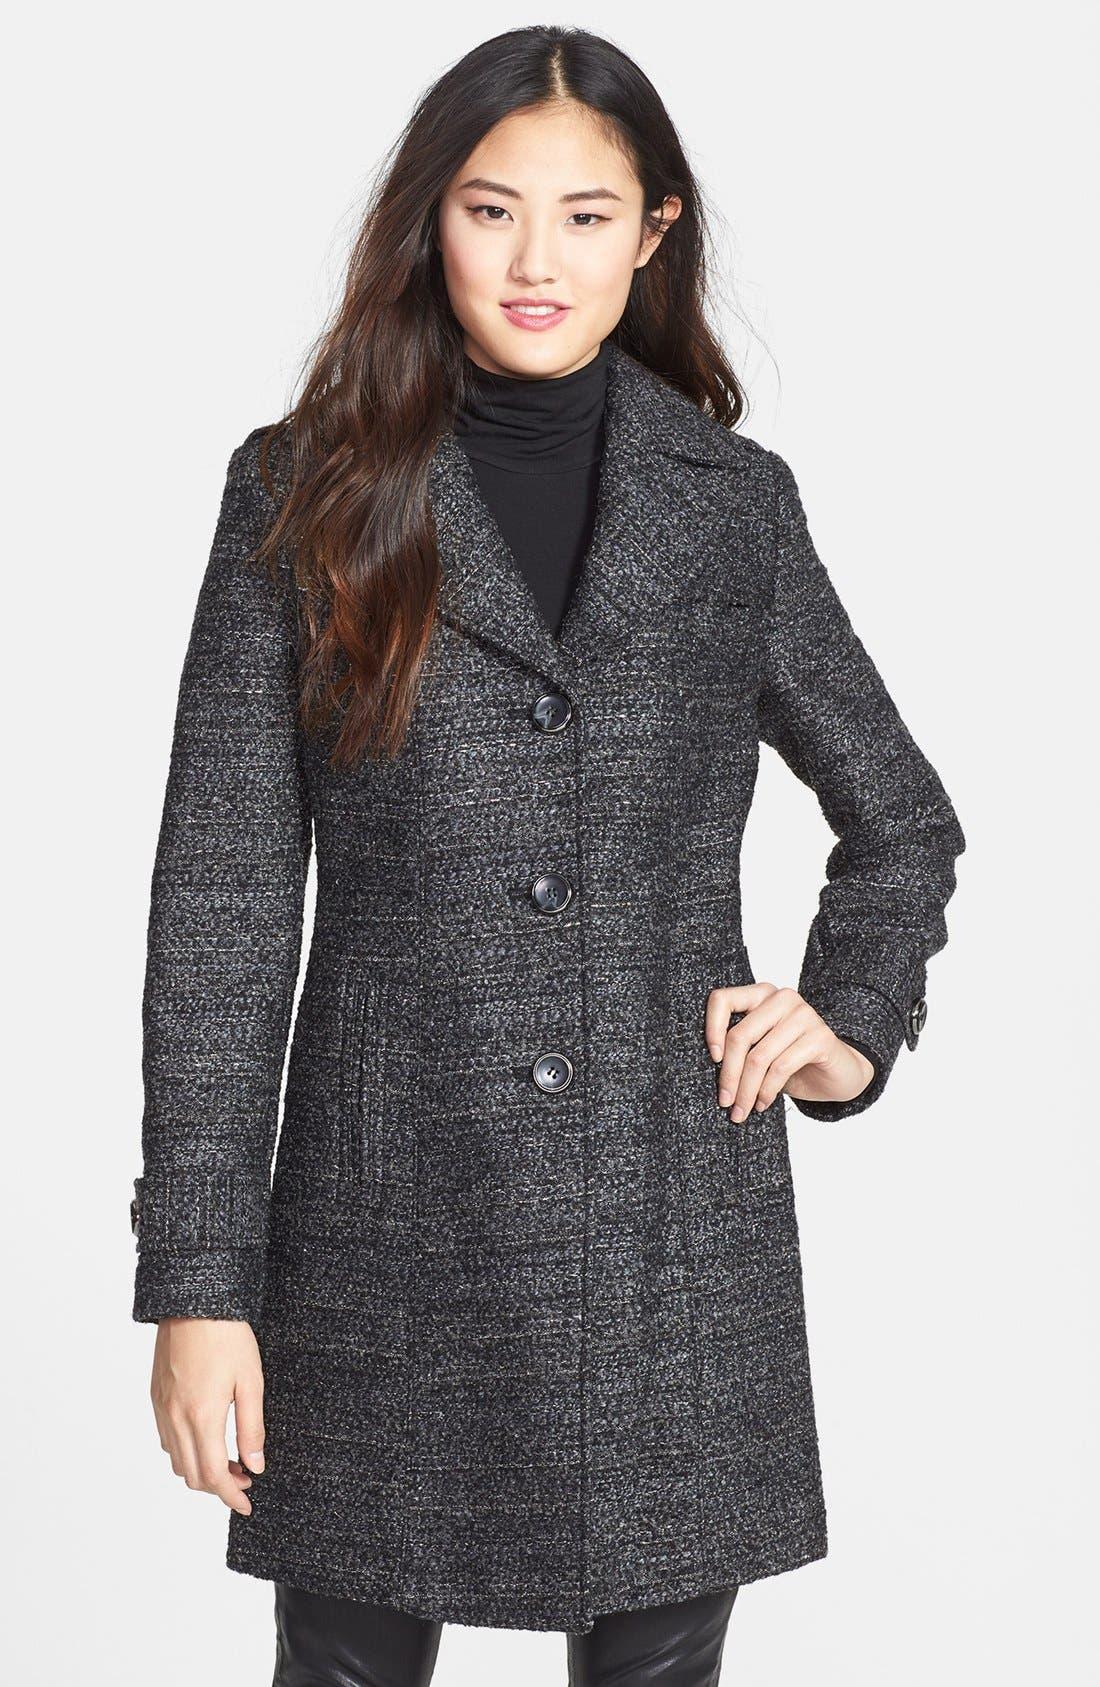 Metallic Tweed Walking Coat,                         Main,                         color, Black